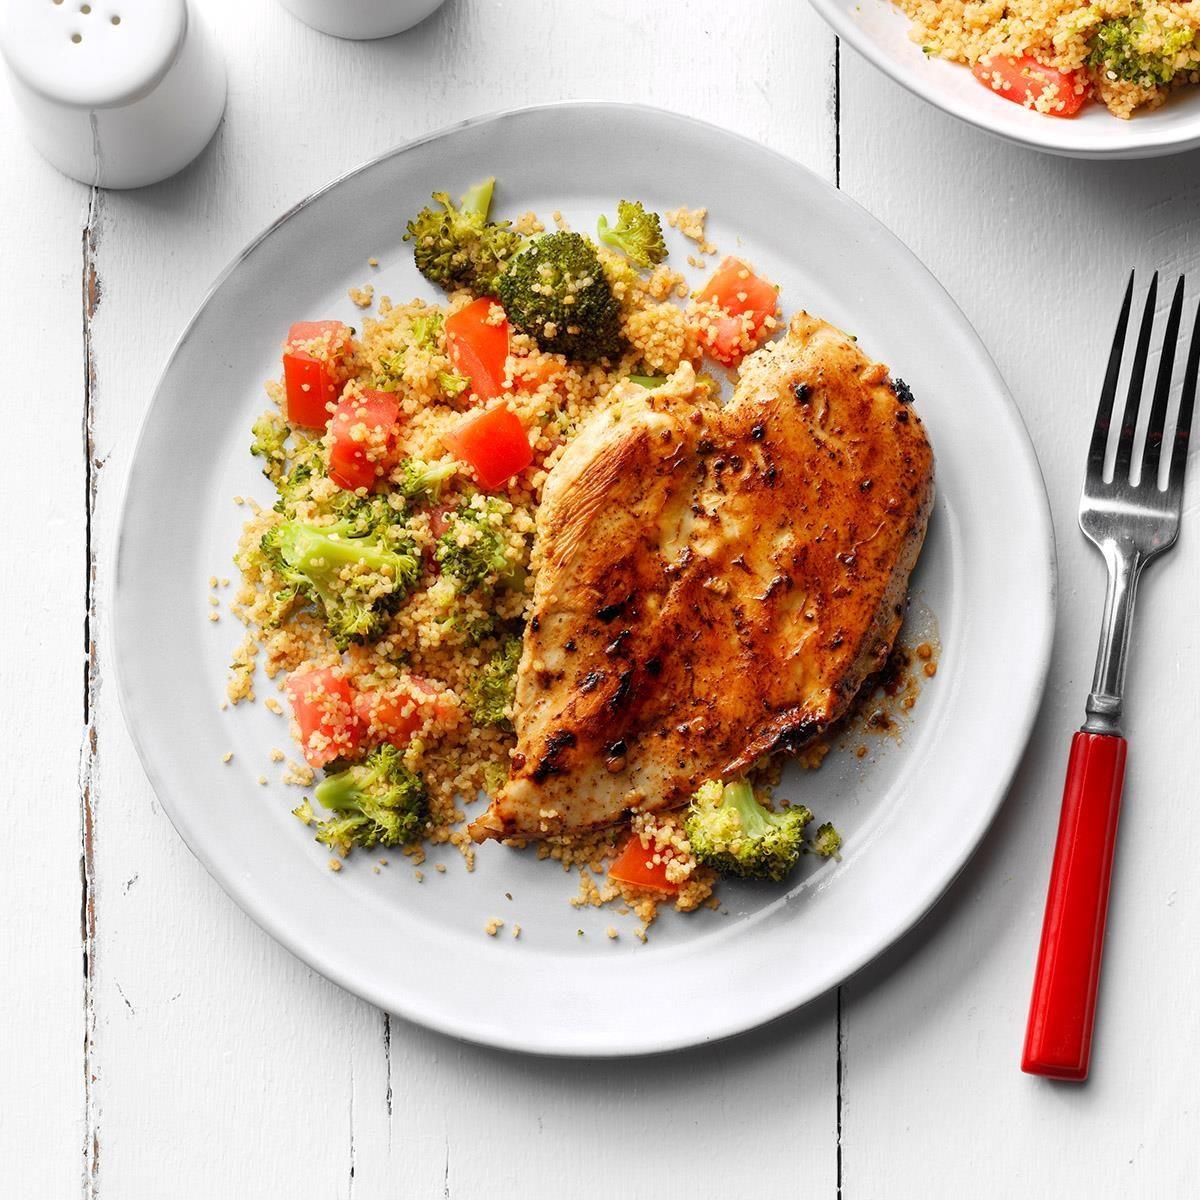 13 Healthy Chicken And Broccoli Recipes